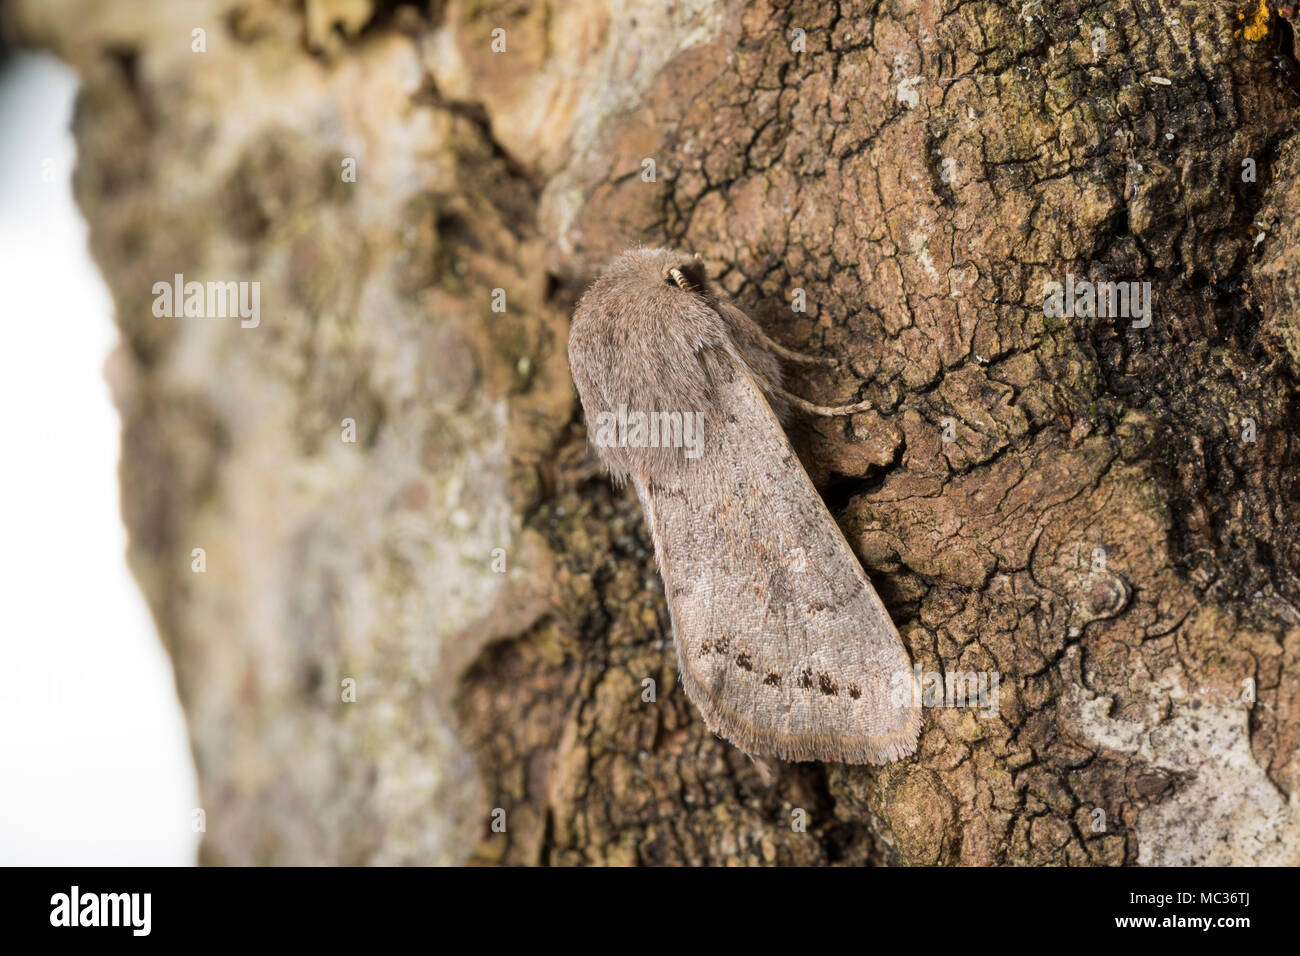 Pappel-Kätzcheneule, Pappel-Kätzchen-Eule, Orthosia populeti, monótona, de color plomo, Noctuidae, Eulenfalter n�tuidos polillas, n�tuidos moth Imagen De Stock